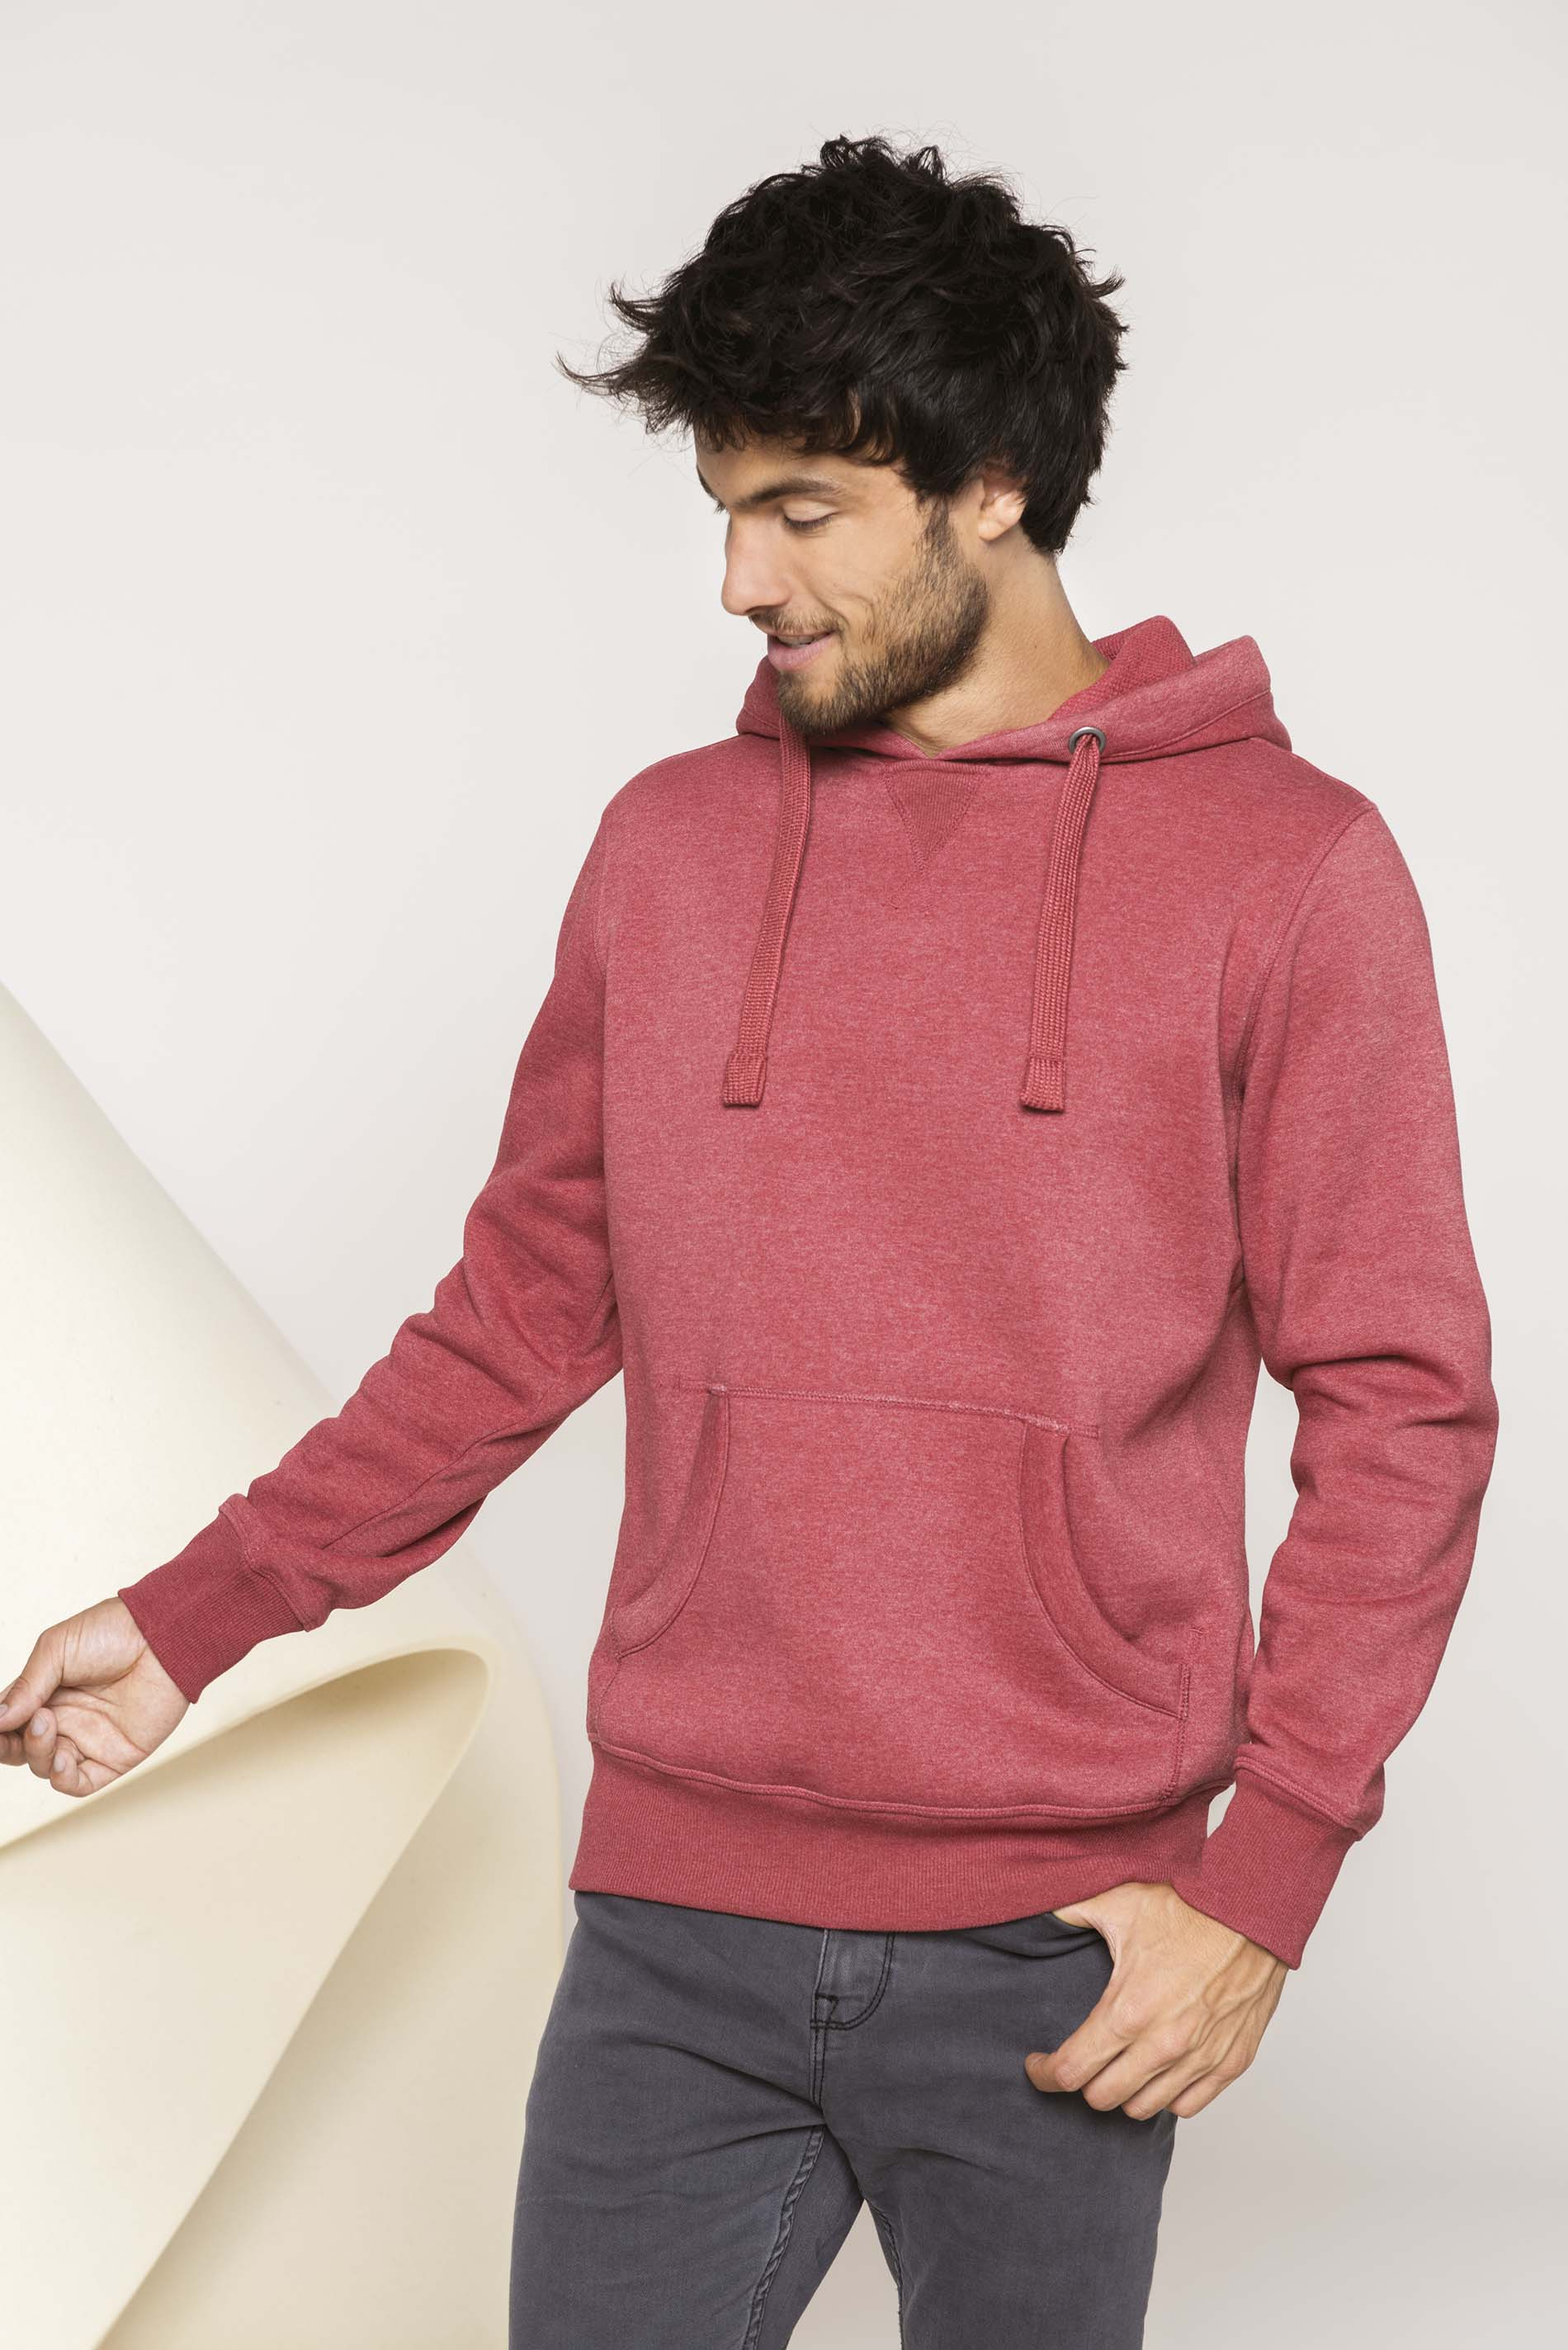 kariban kapuzen sweatshirt mischgewebe g nstig online kaufen. Black Bedroom Furniture Sets. Home Design Ideas